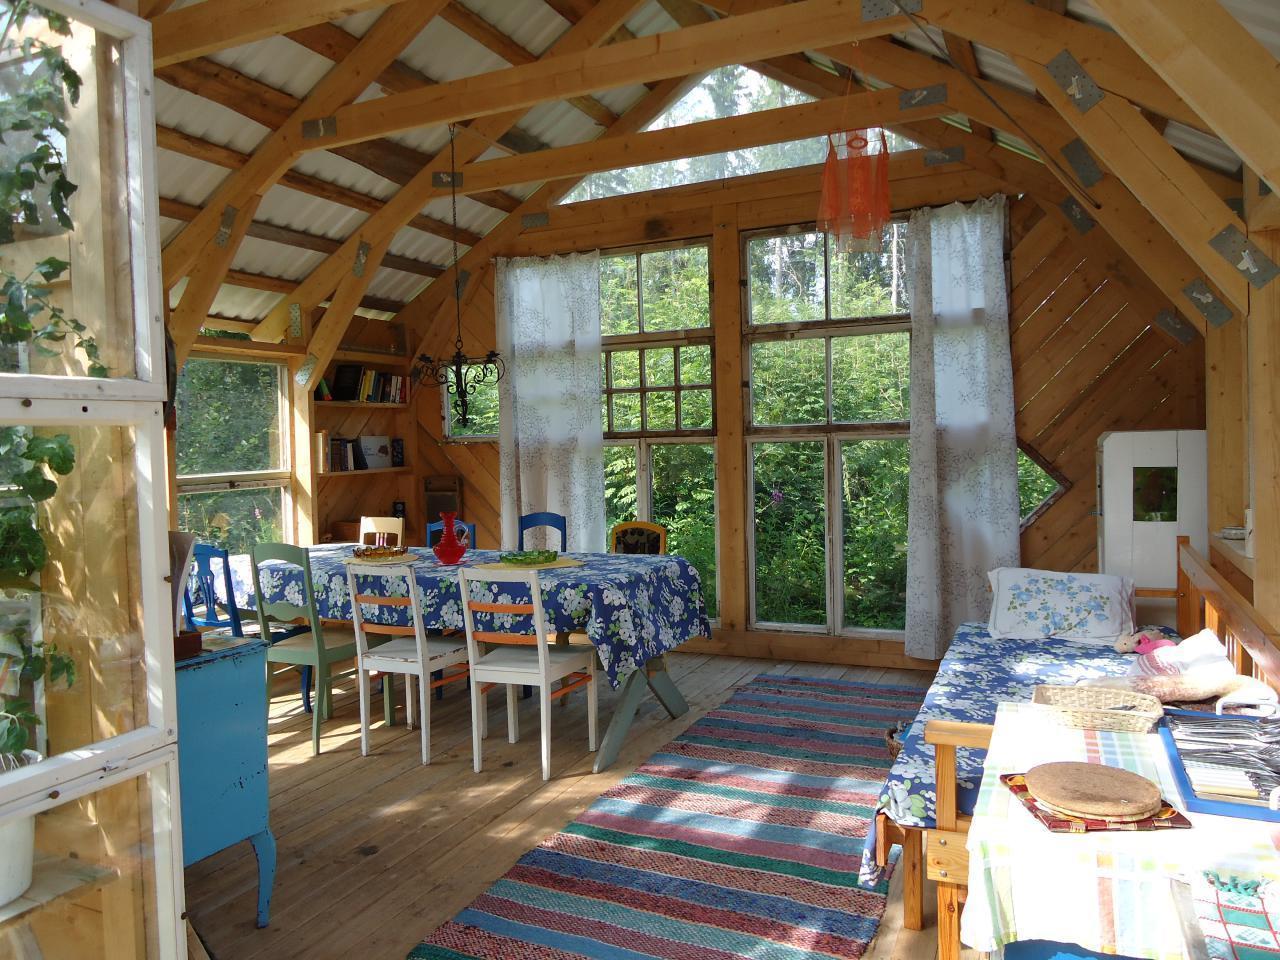 Ferienhaus - Mökki mit Sauna direkt am See  in Mouhijärvi-Sastamala (1707905), Mouhijärvi, , Westfinnland, Finnland, Bild 7